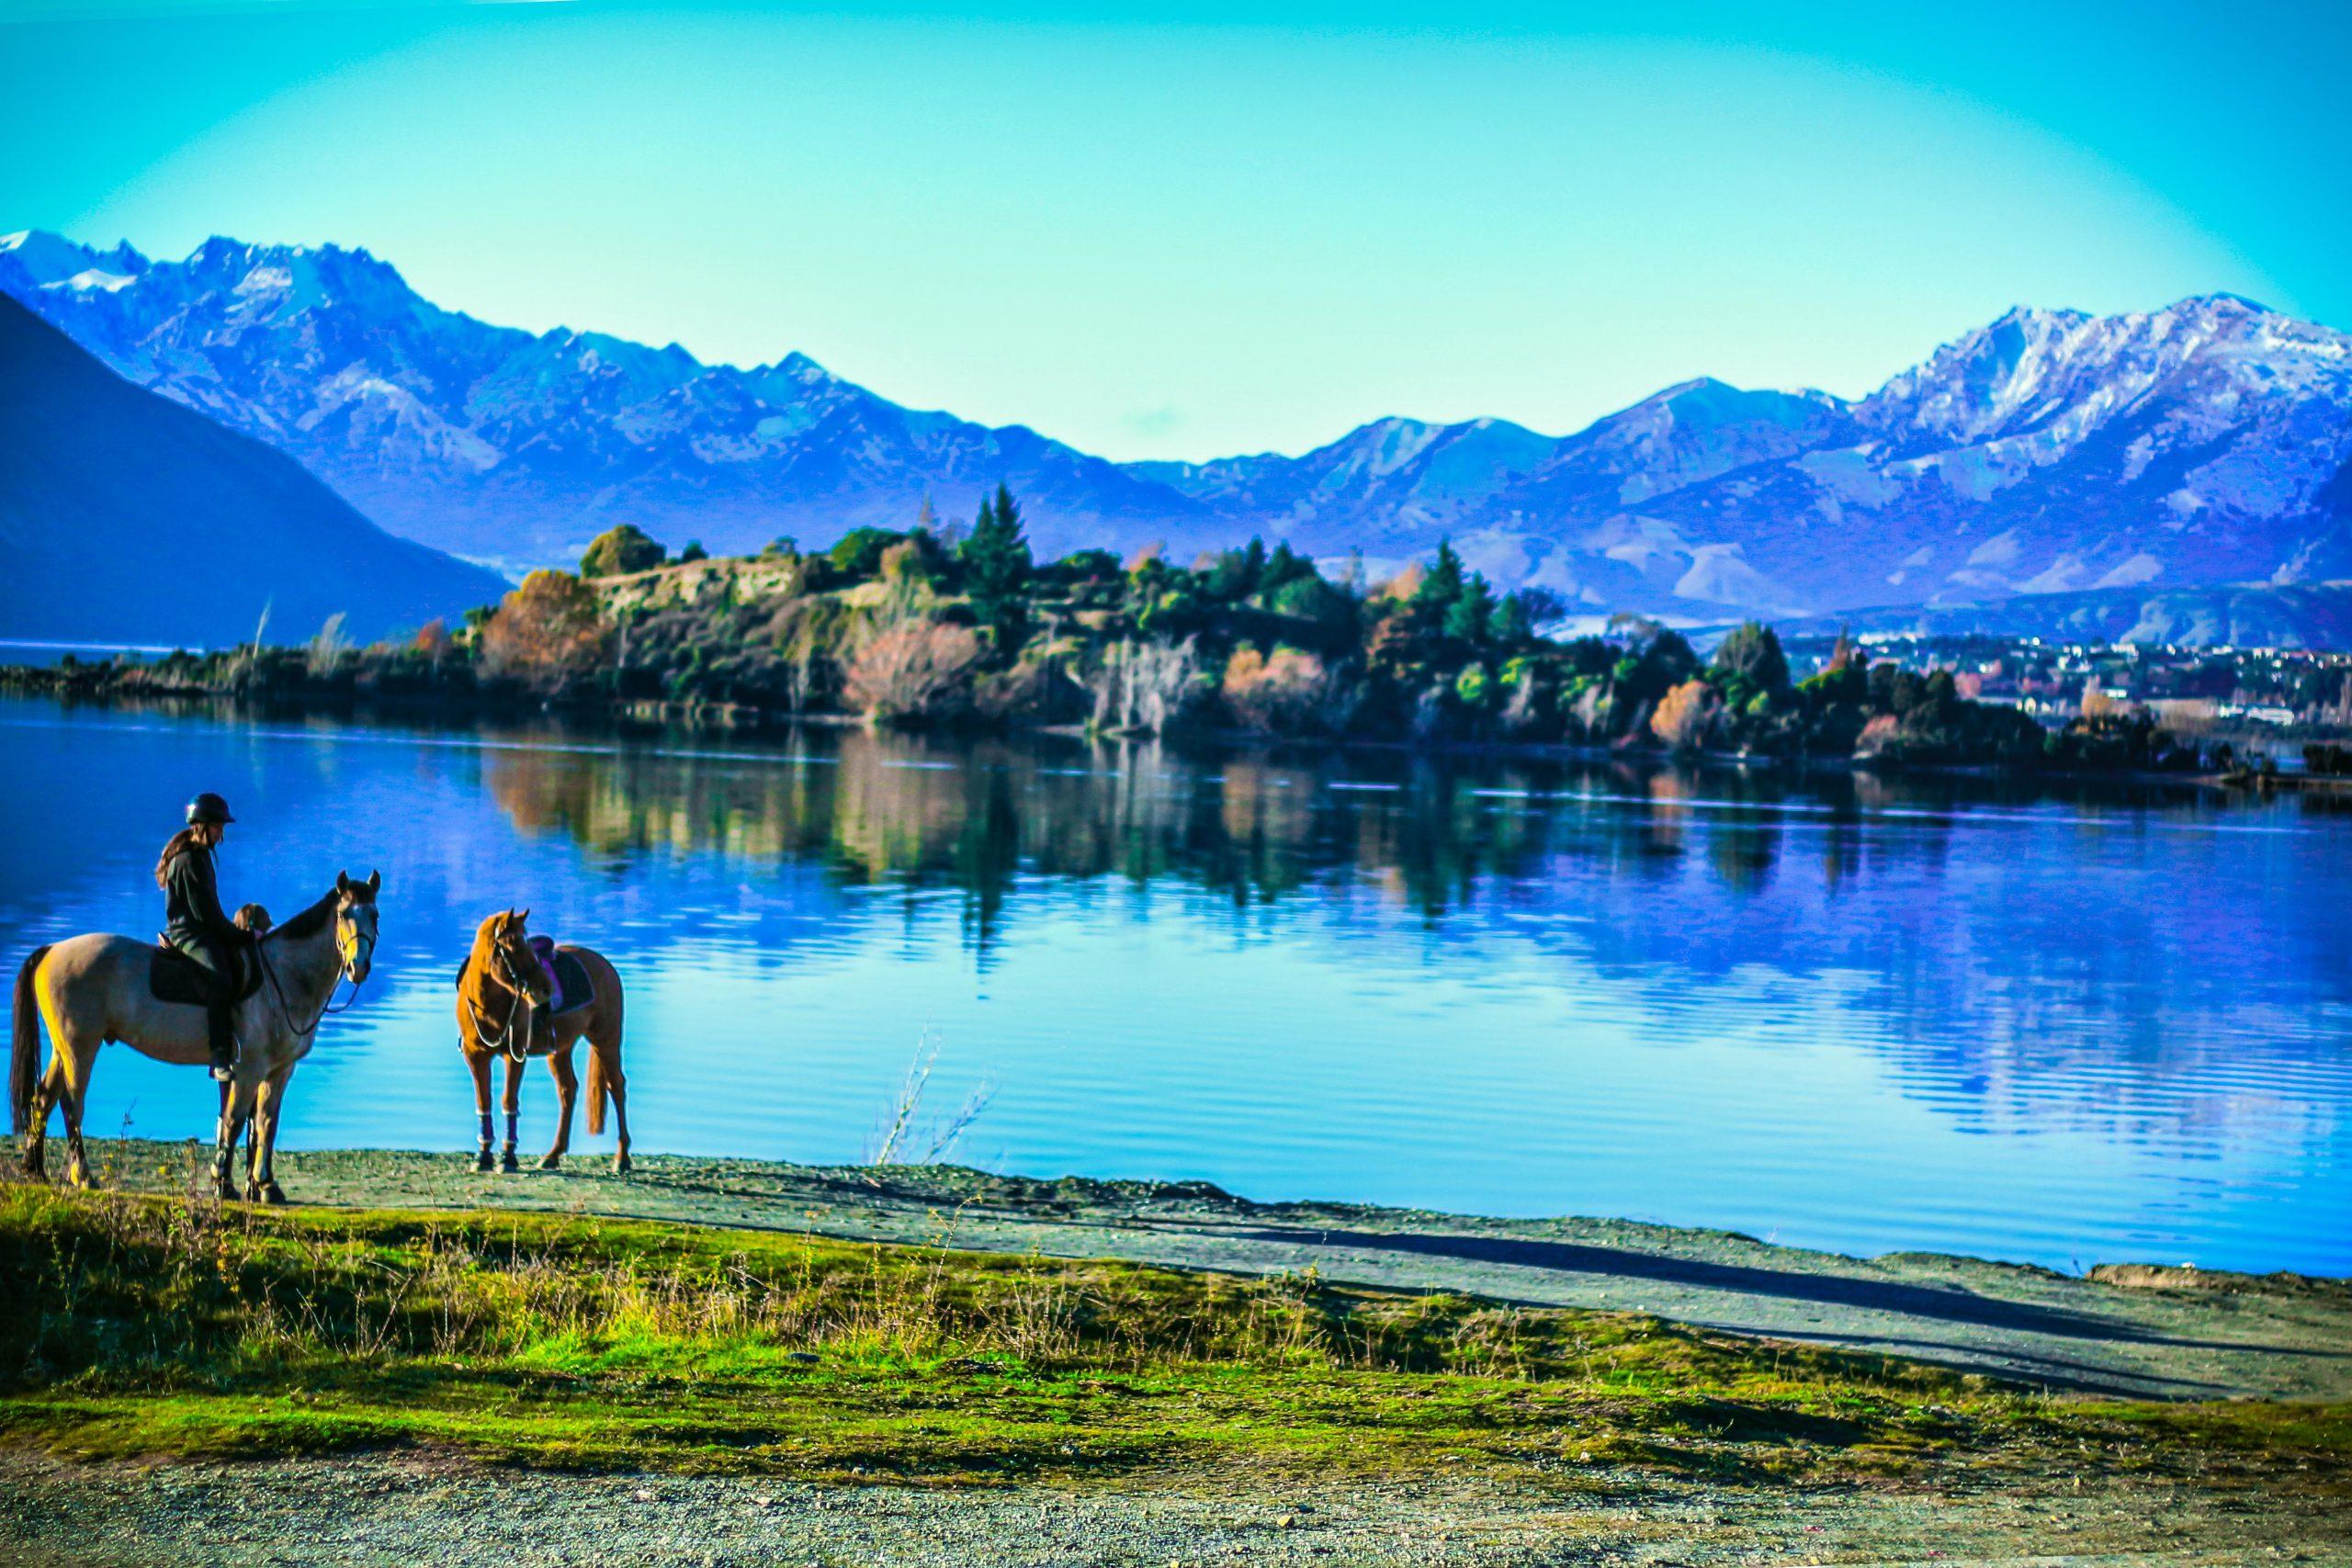 horse ride near the lake